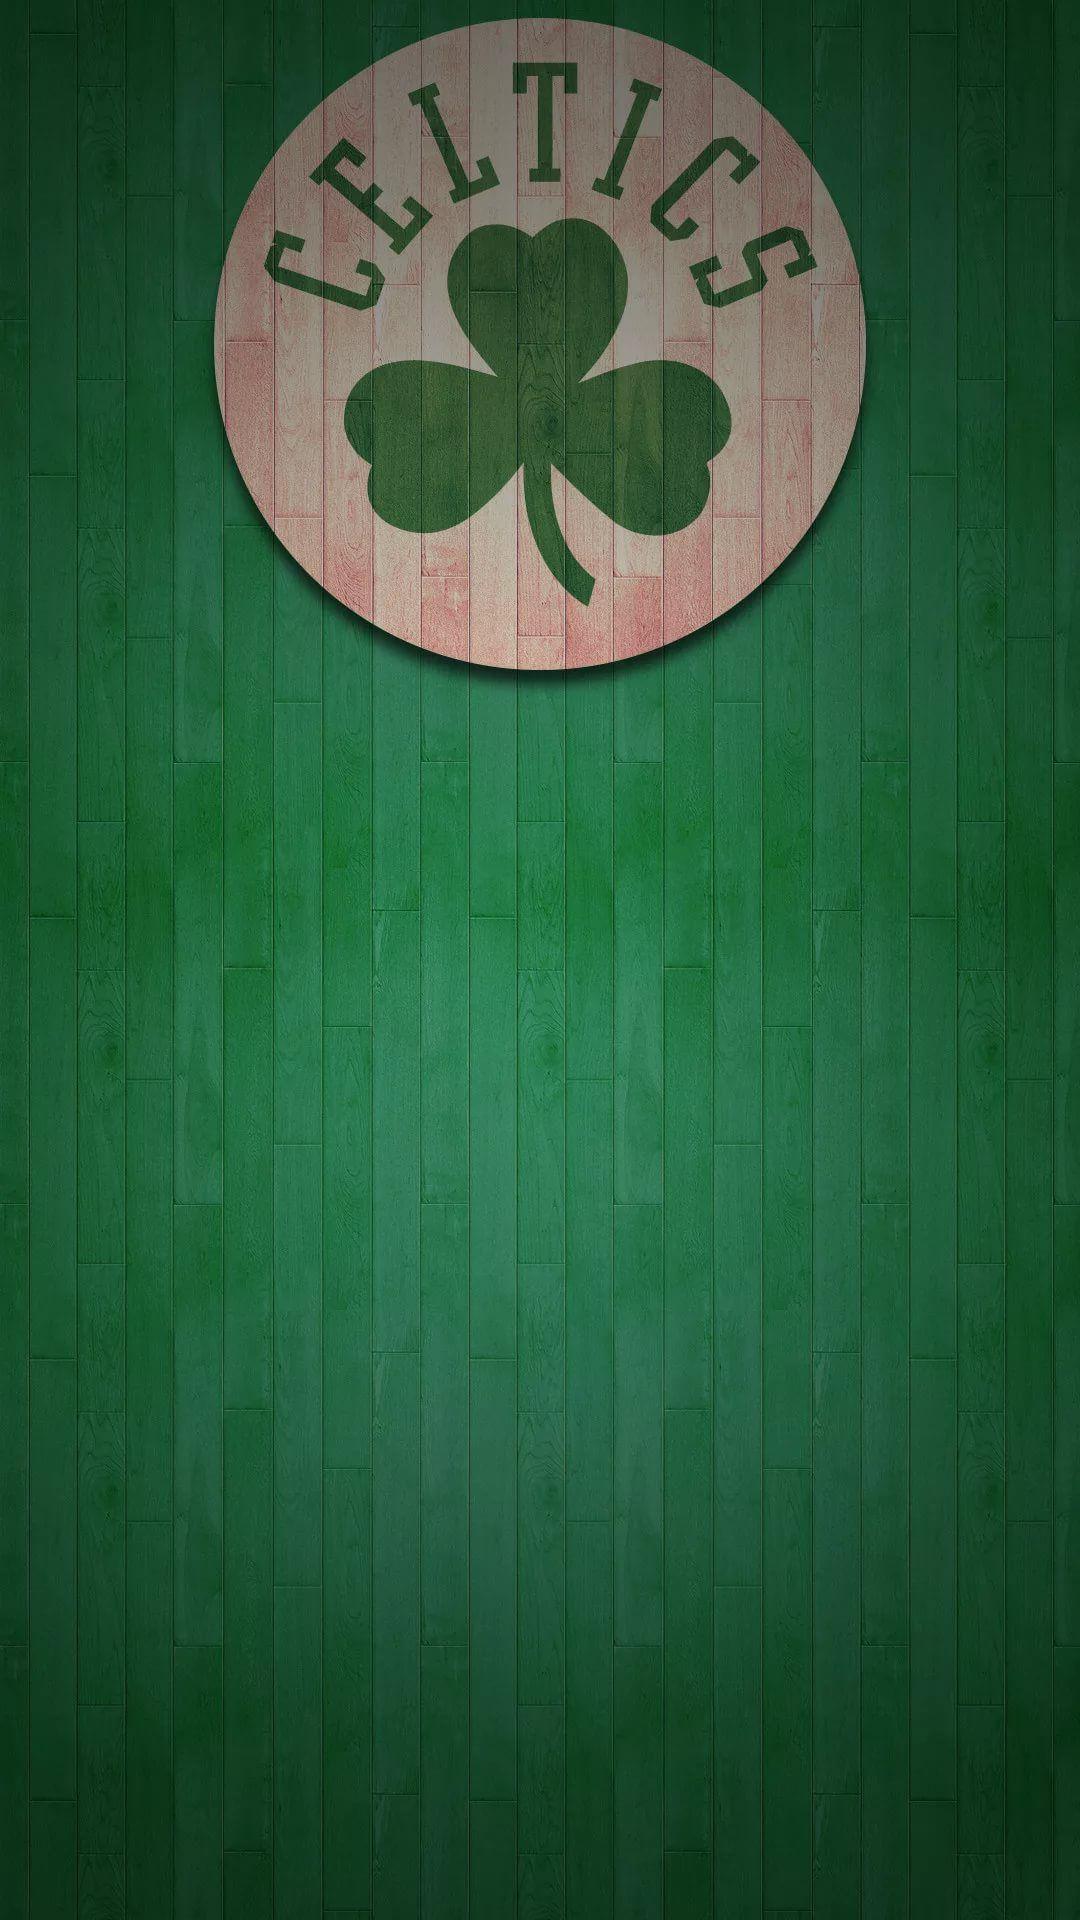 Celtic Fc iPhone 5 wallpaper